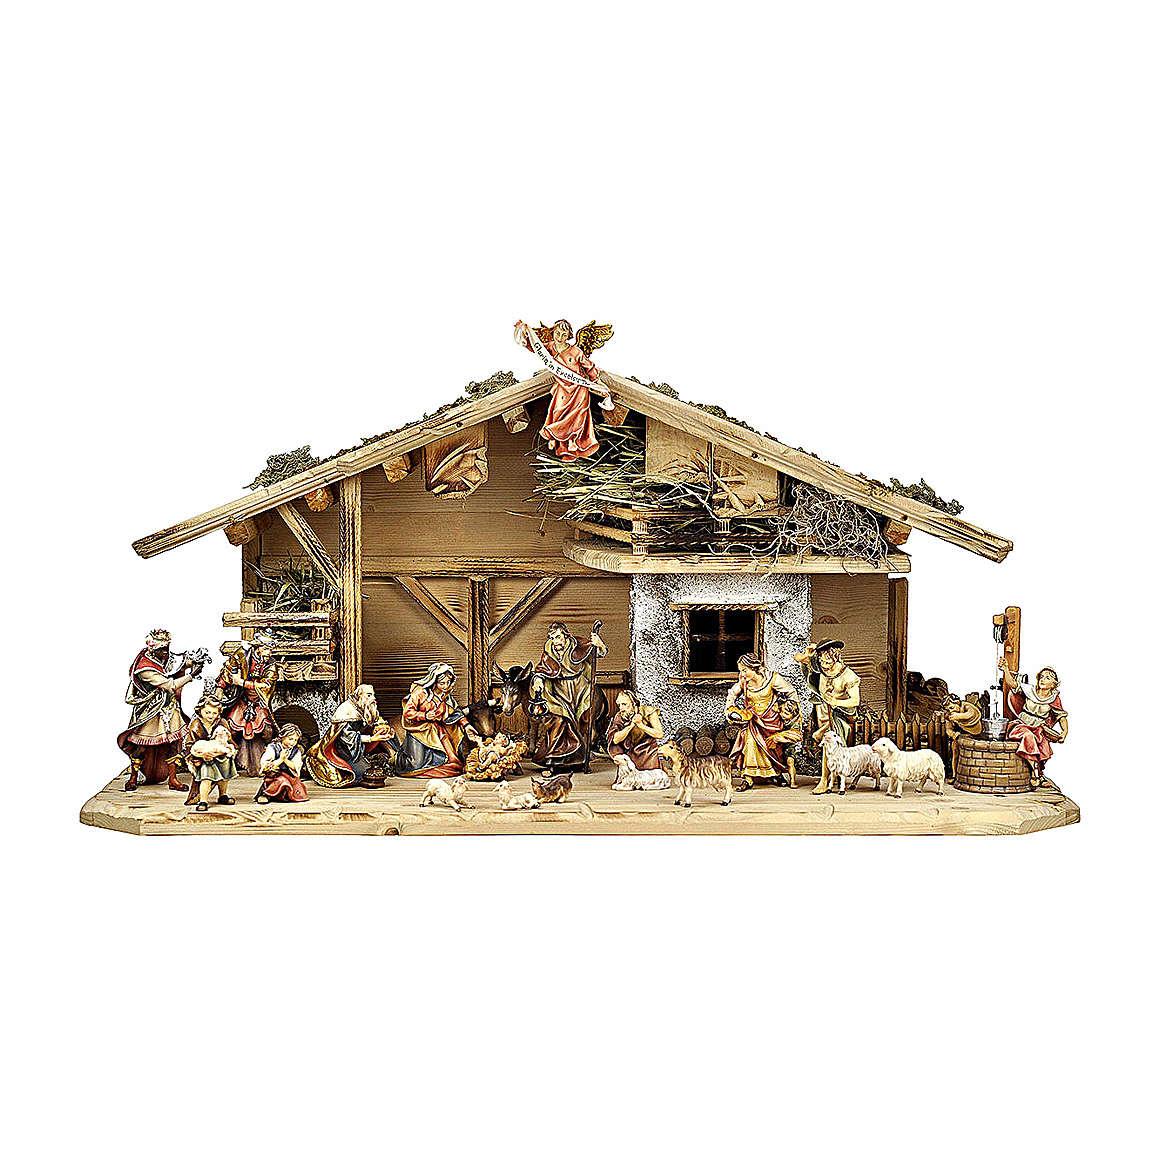 Presepe Re Magi pastori, bue e asino mod. Original legno dipinto Val Gardena 12 cm - 22 pz 4